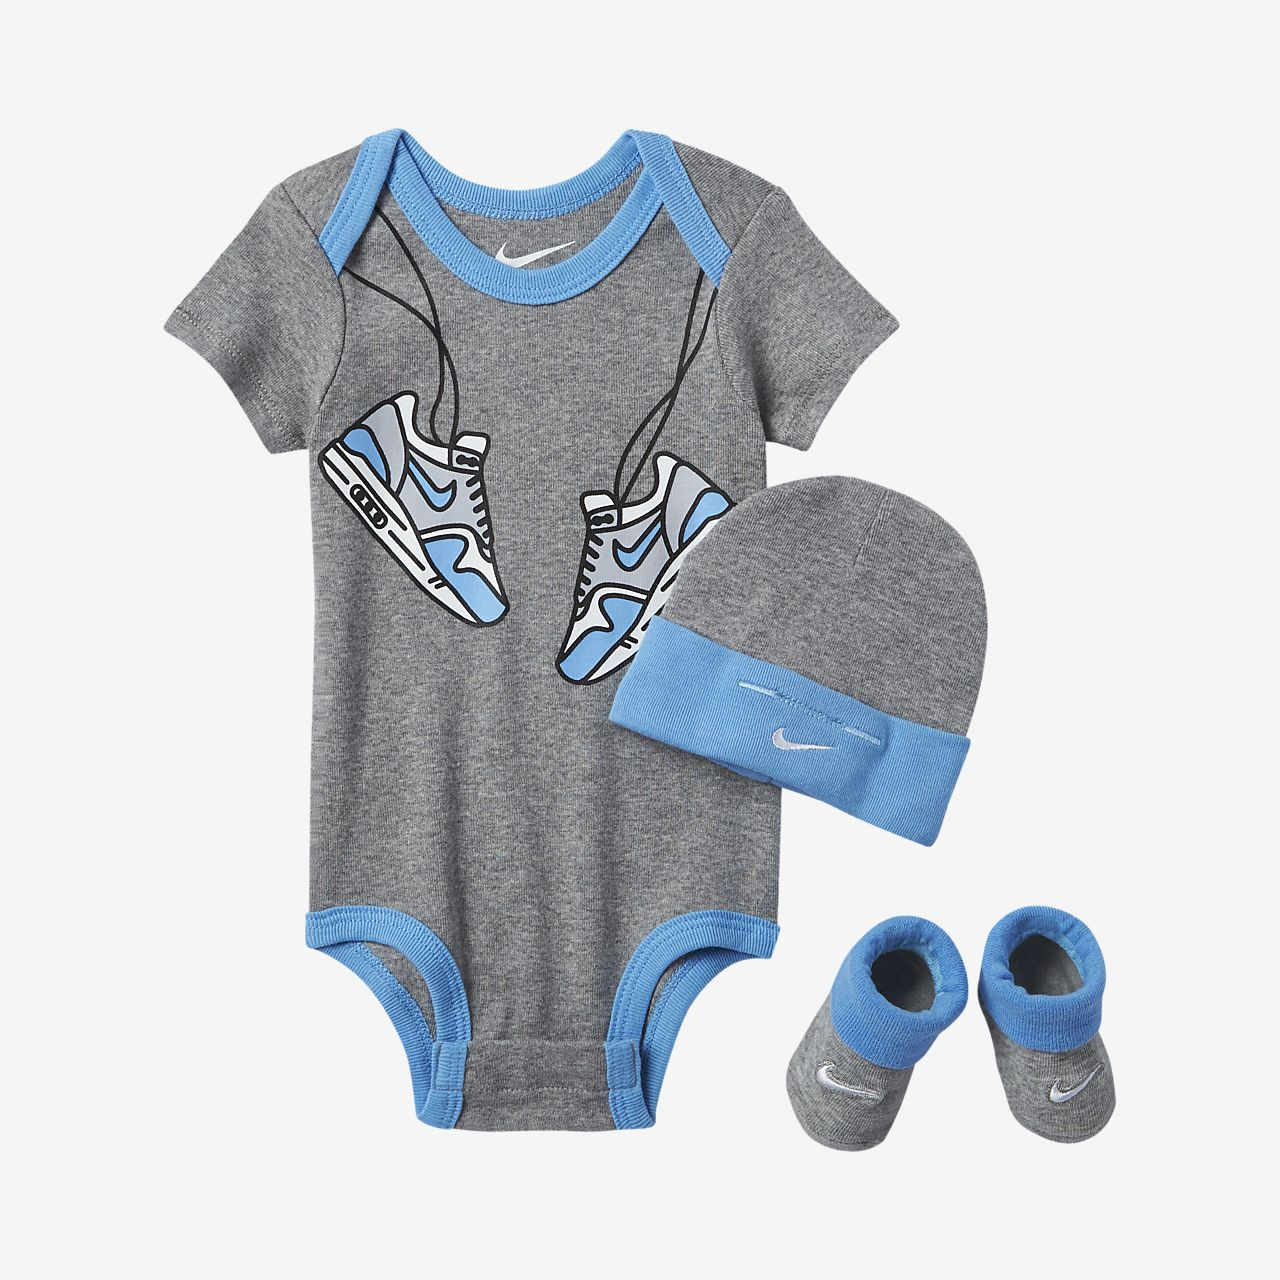 Low Resolution Trojdílná kojenecká souprava Nike Air Trojdílná kojenecká  souprava Nike Air 30b2ee3cc9